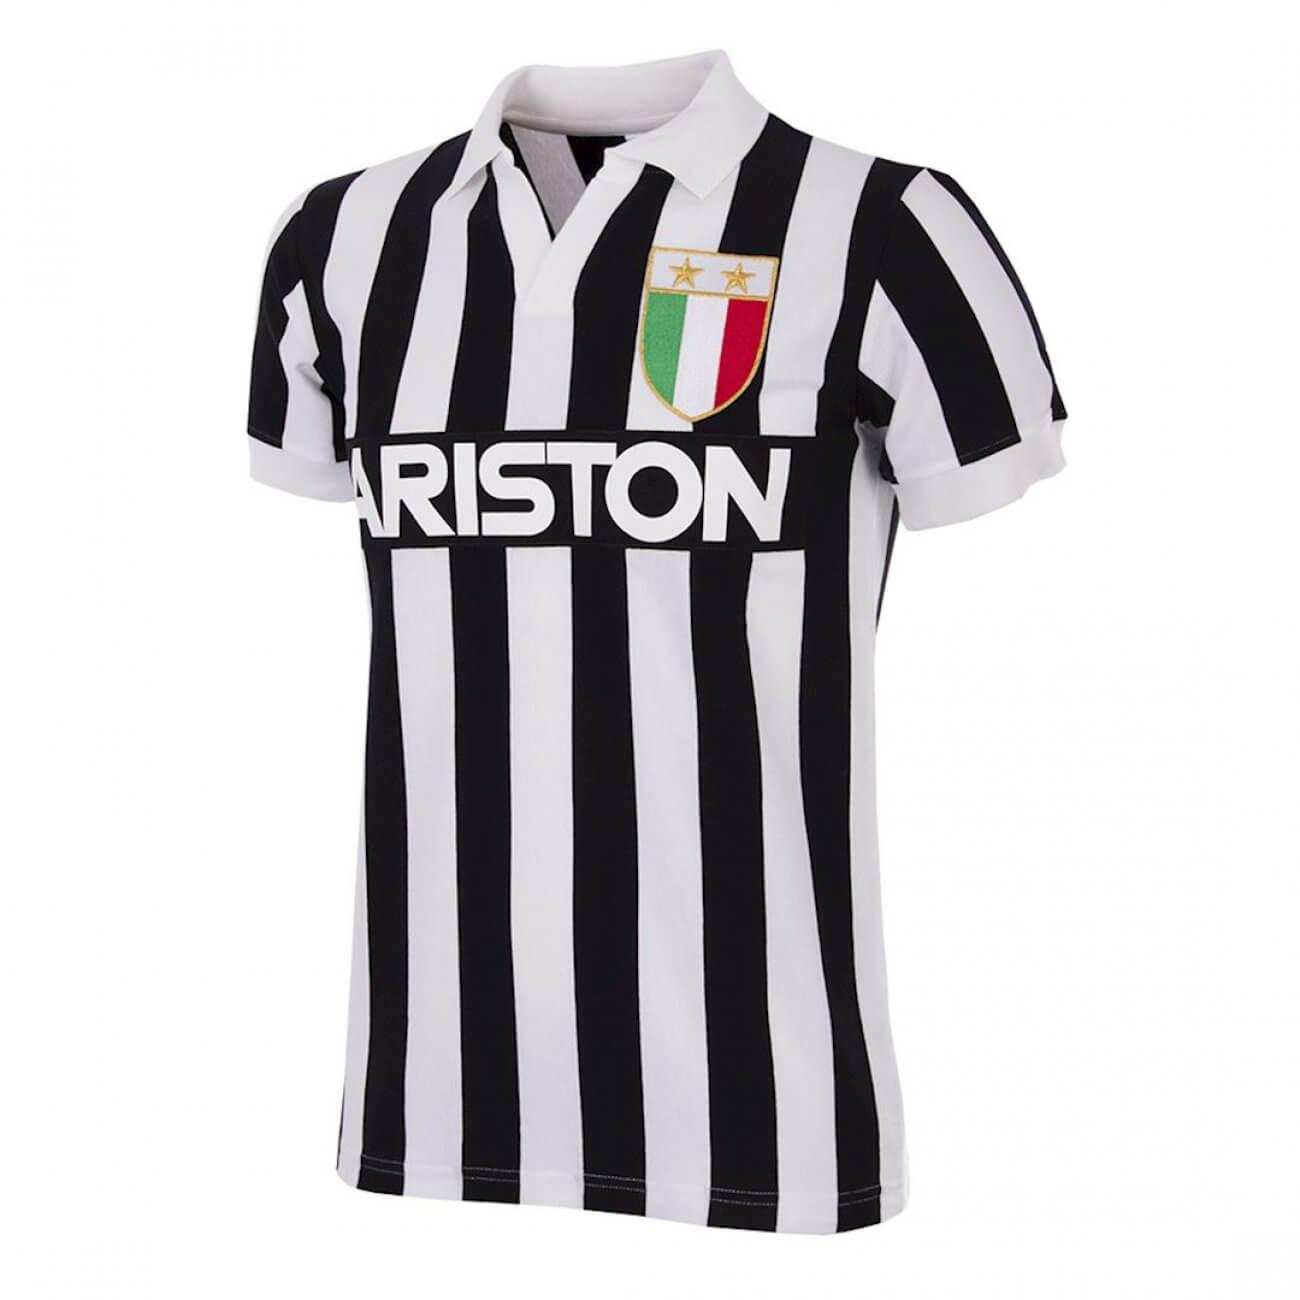 purchase cheap 9f57c 17218 Juventus 1984/85 Retro Shirt